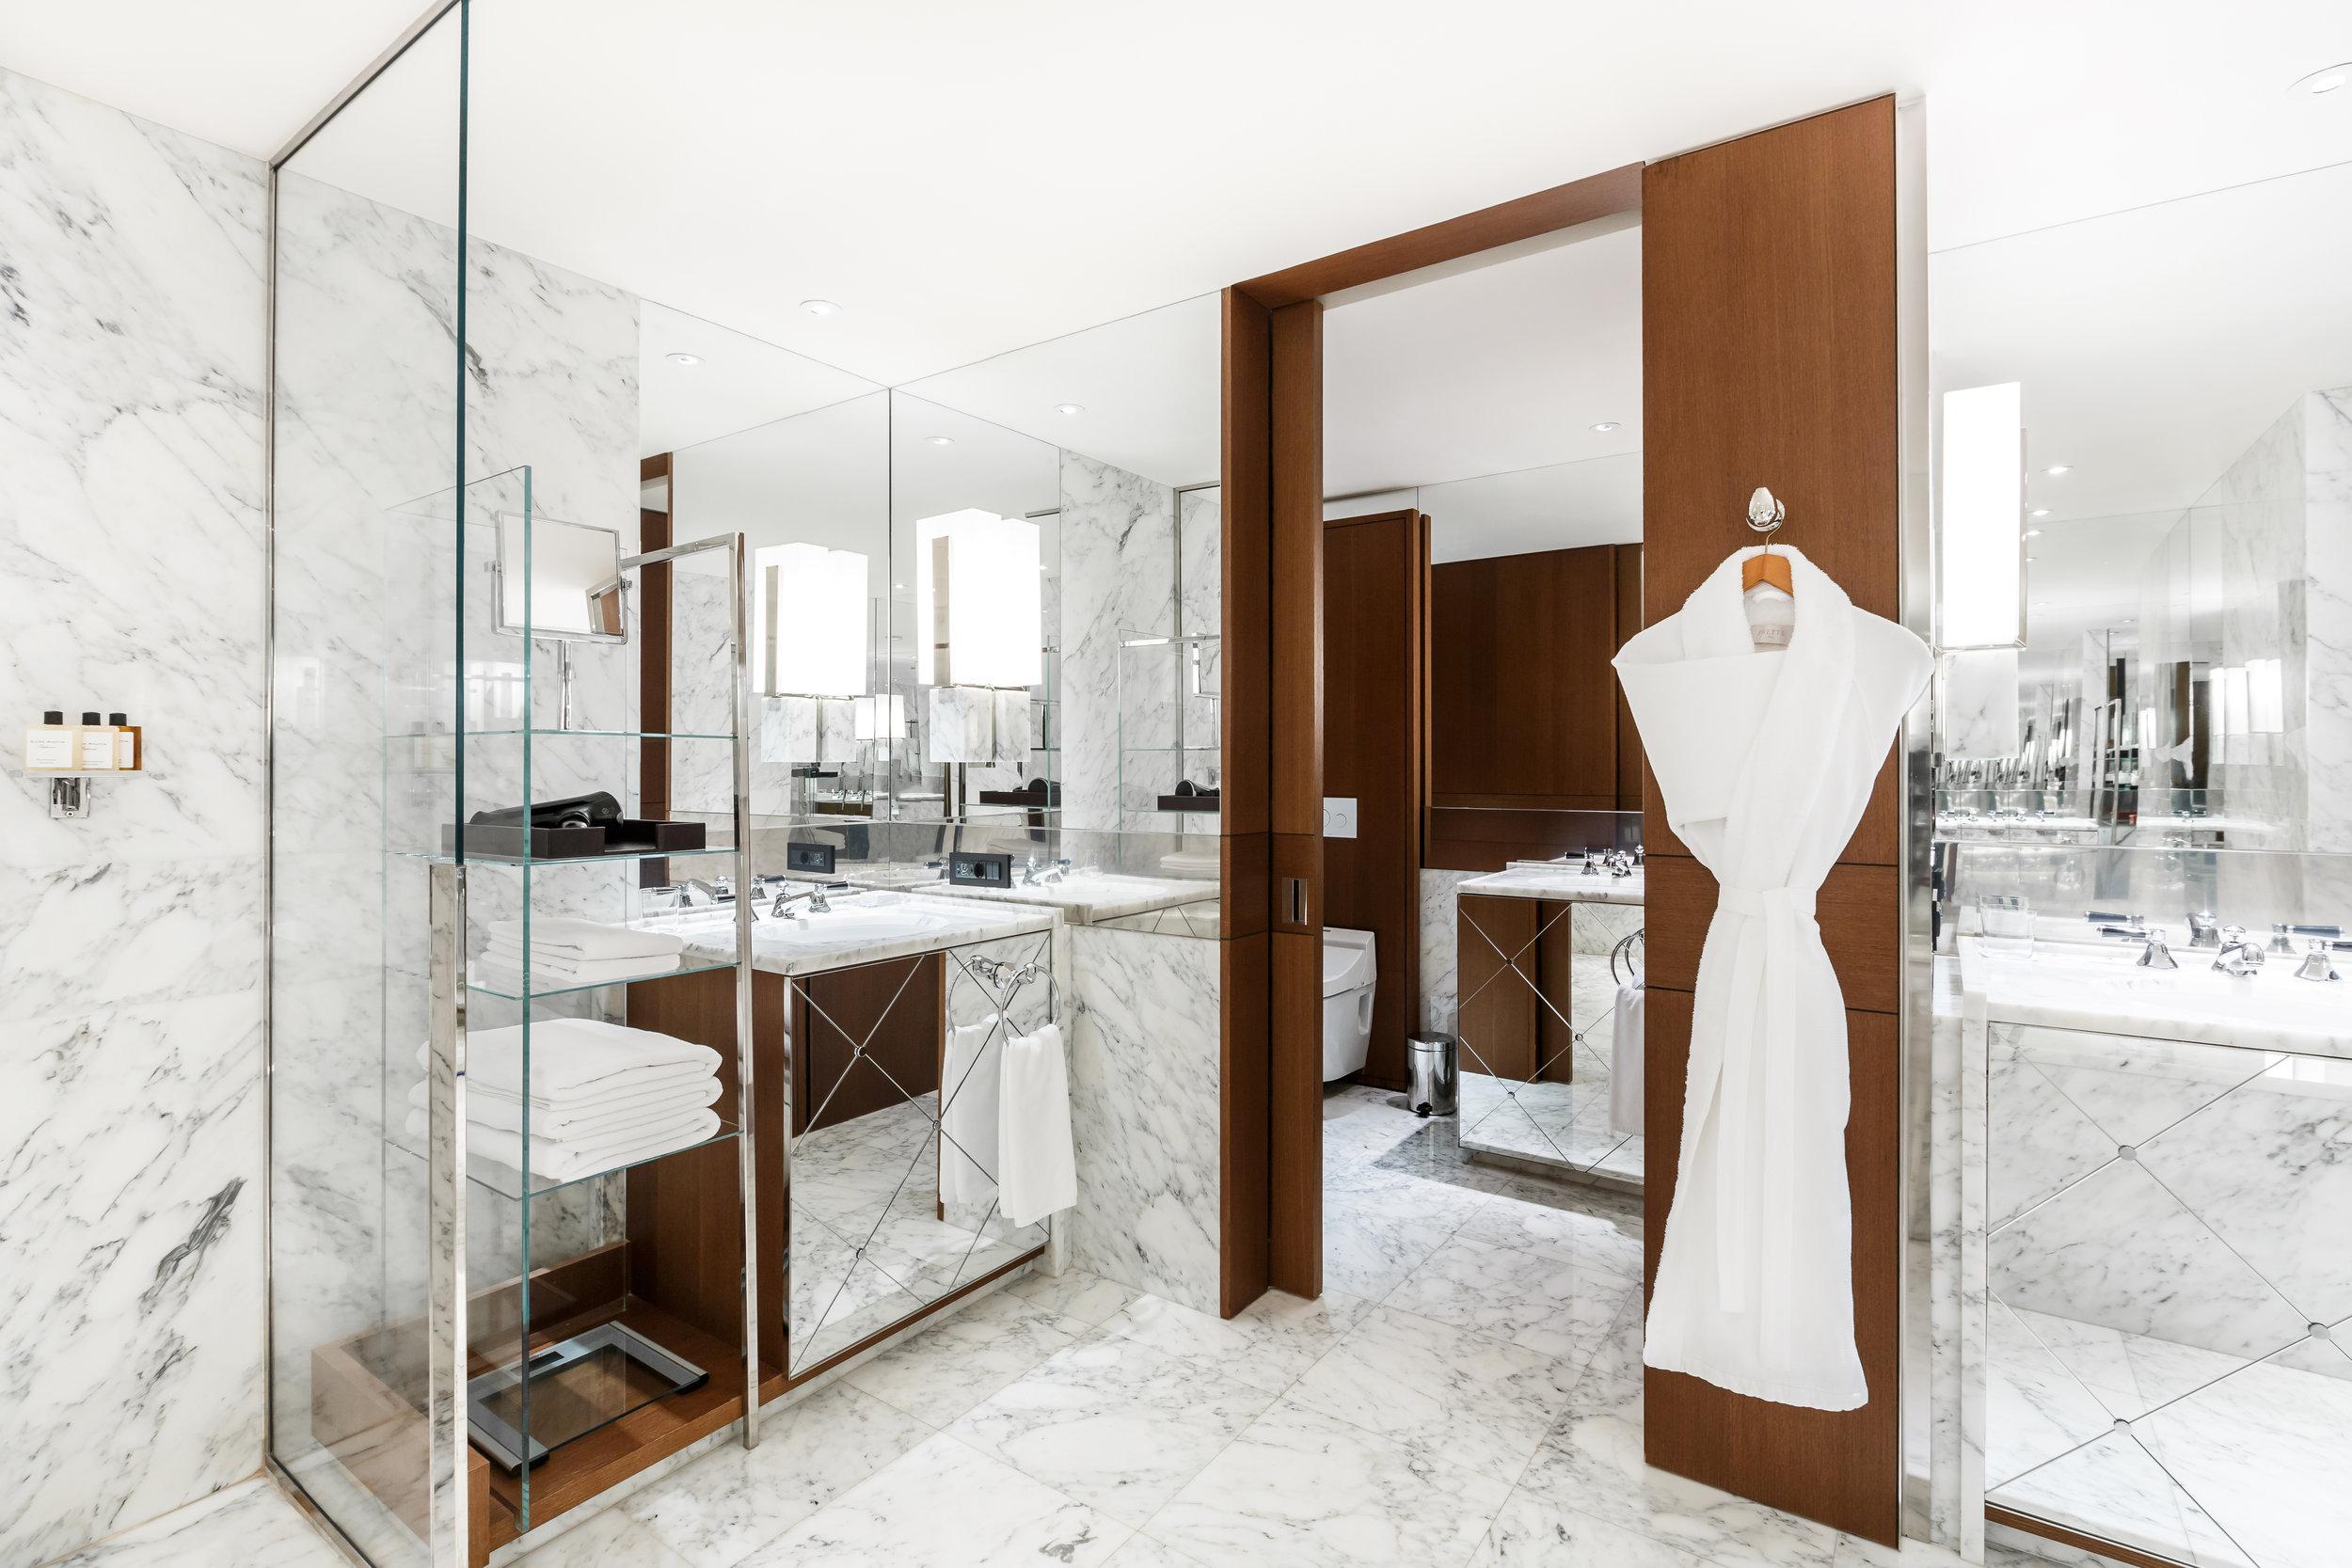 Ararat-Park-Hyatt-Moscow-Park-Terrace-Suite-Bathroom-Mirrow.jpg